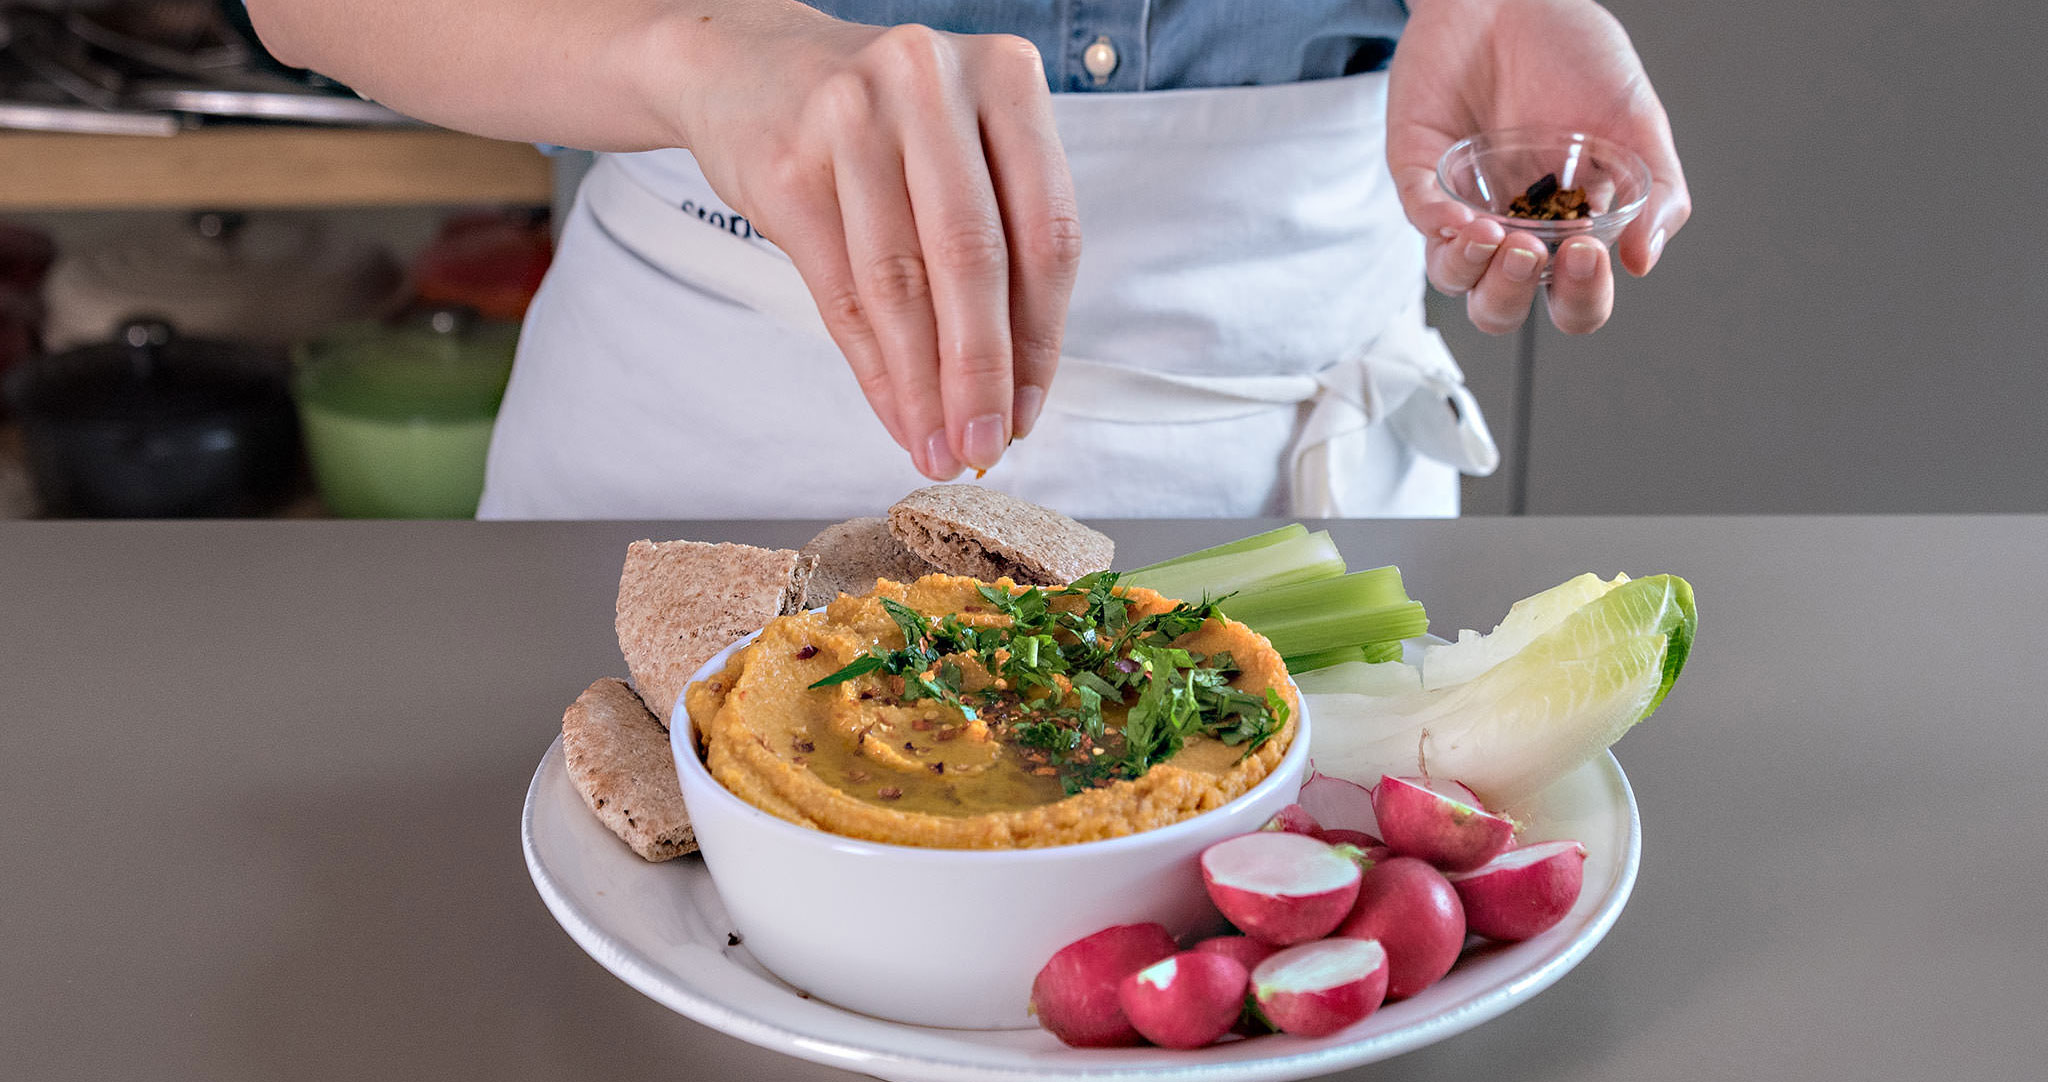 Karotten-Hummus-Dip Hummus-Rezept servieren